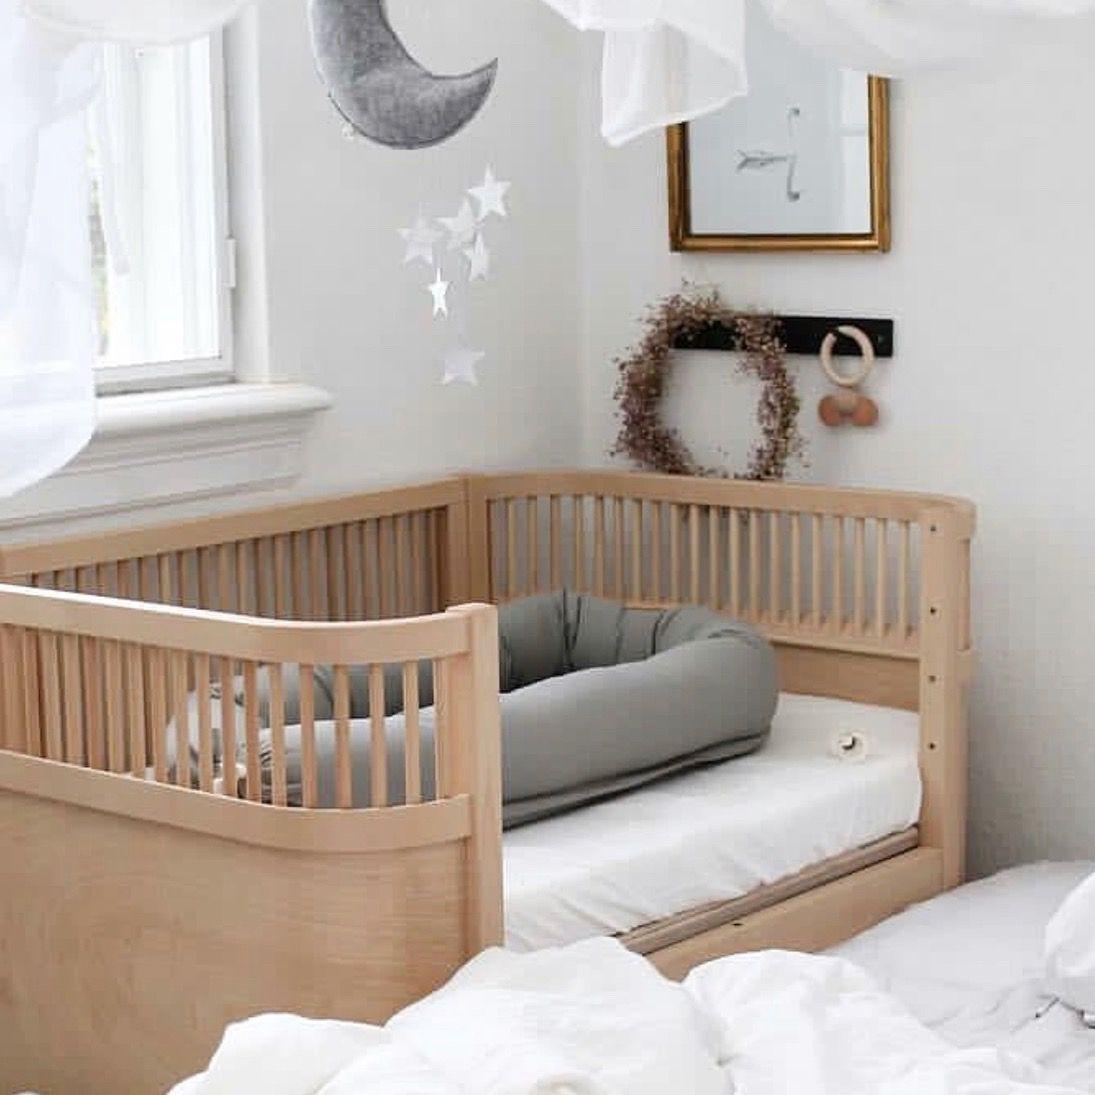 Sebra Babybett Babybett Ikea Babybett Boho Kinderzimmer